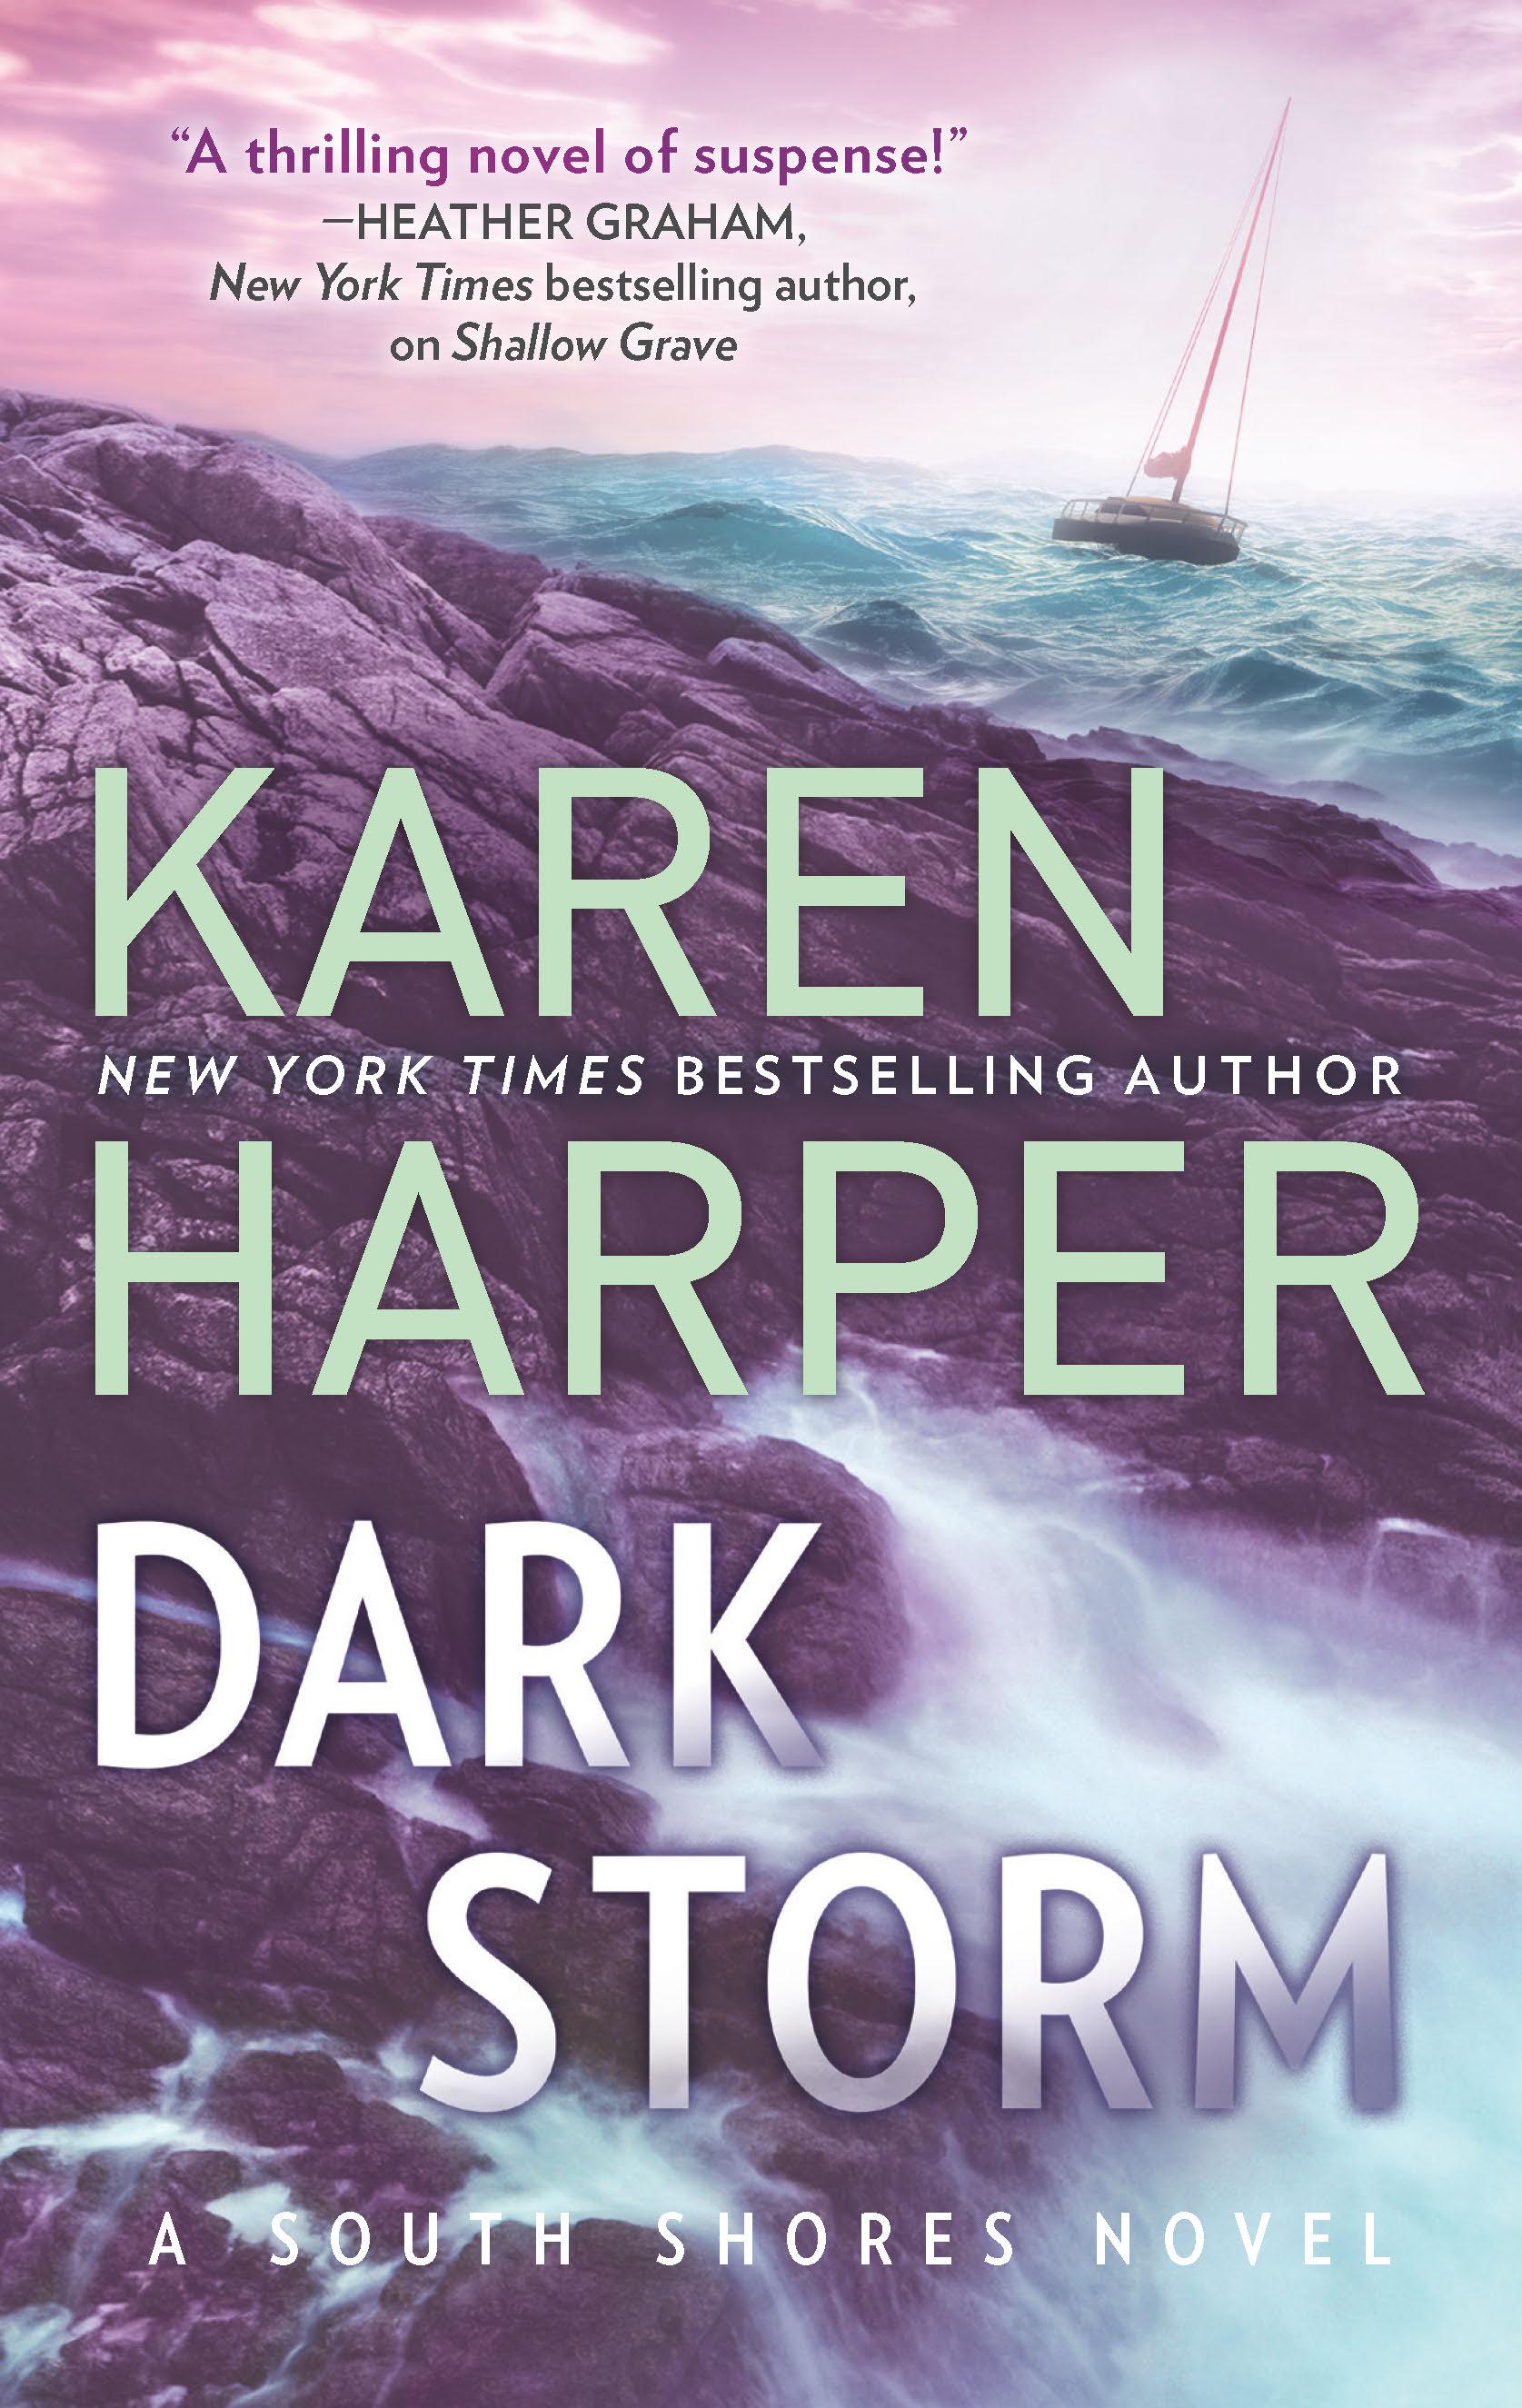 5-28_Karen_Harper_DARK_STORM.jpg